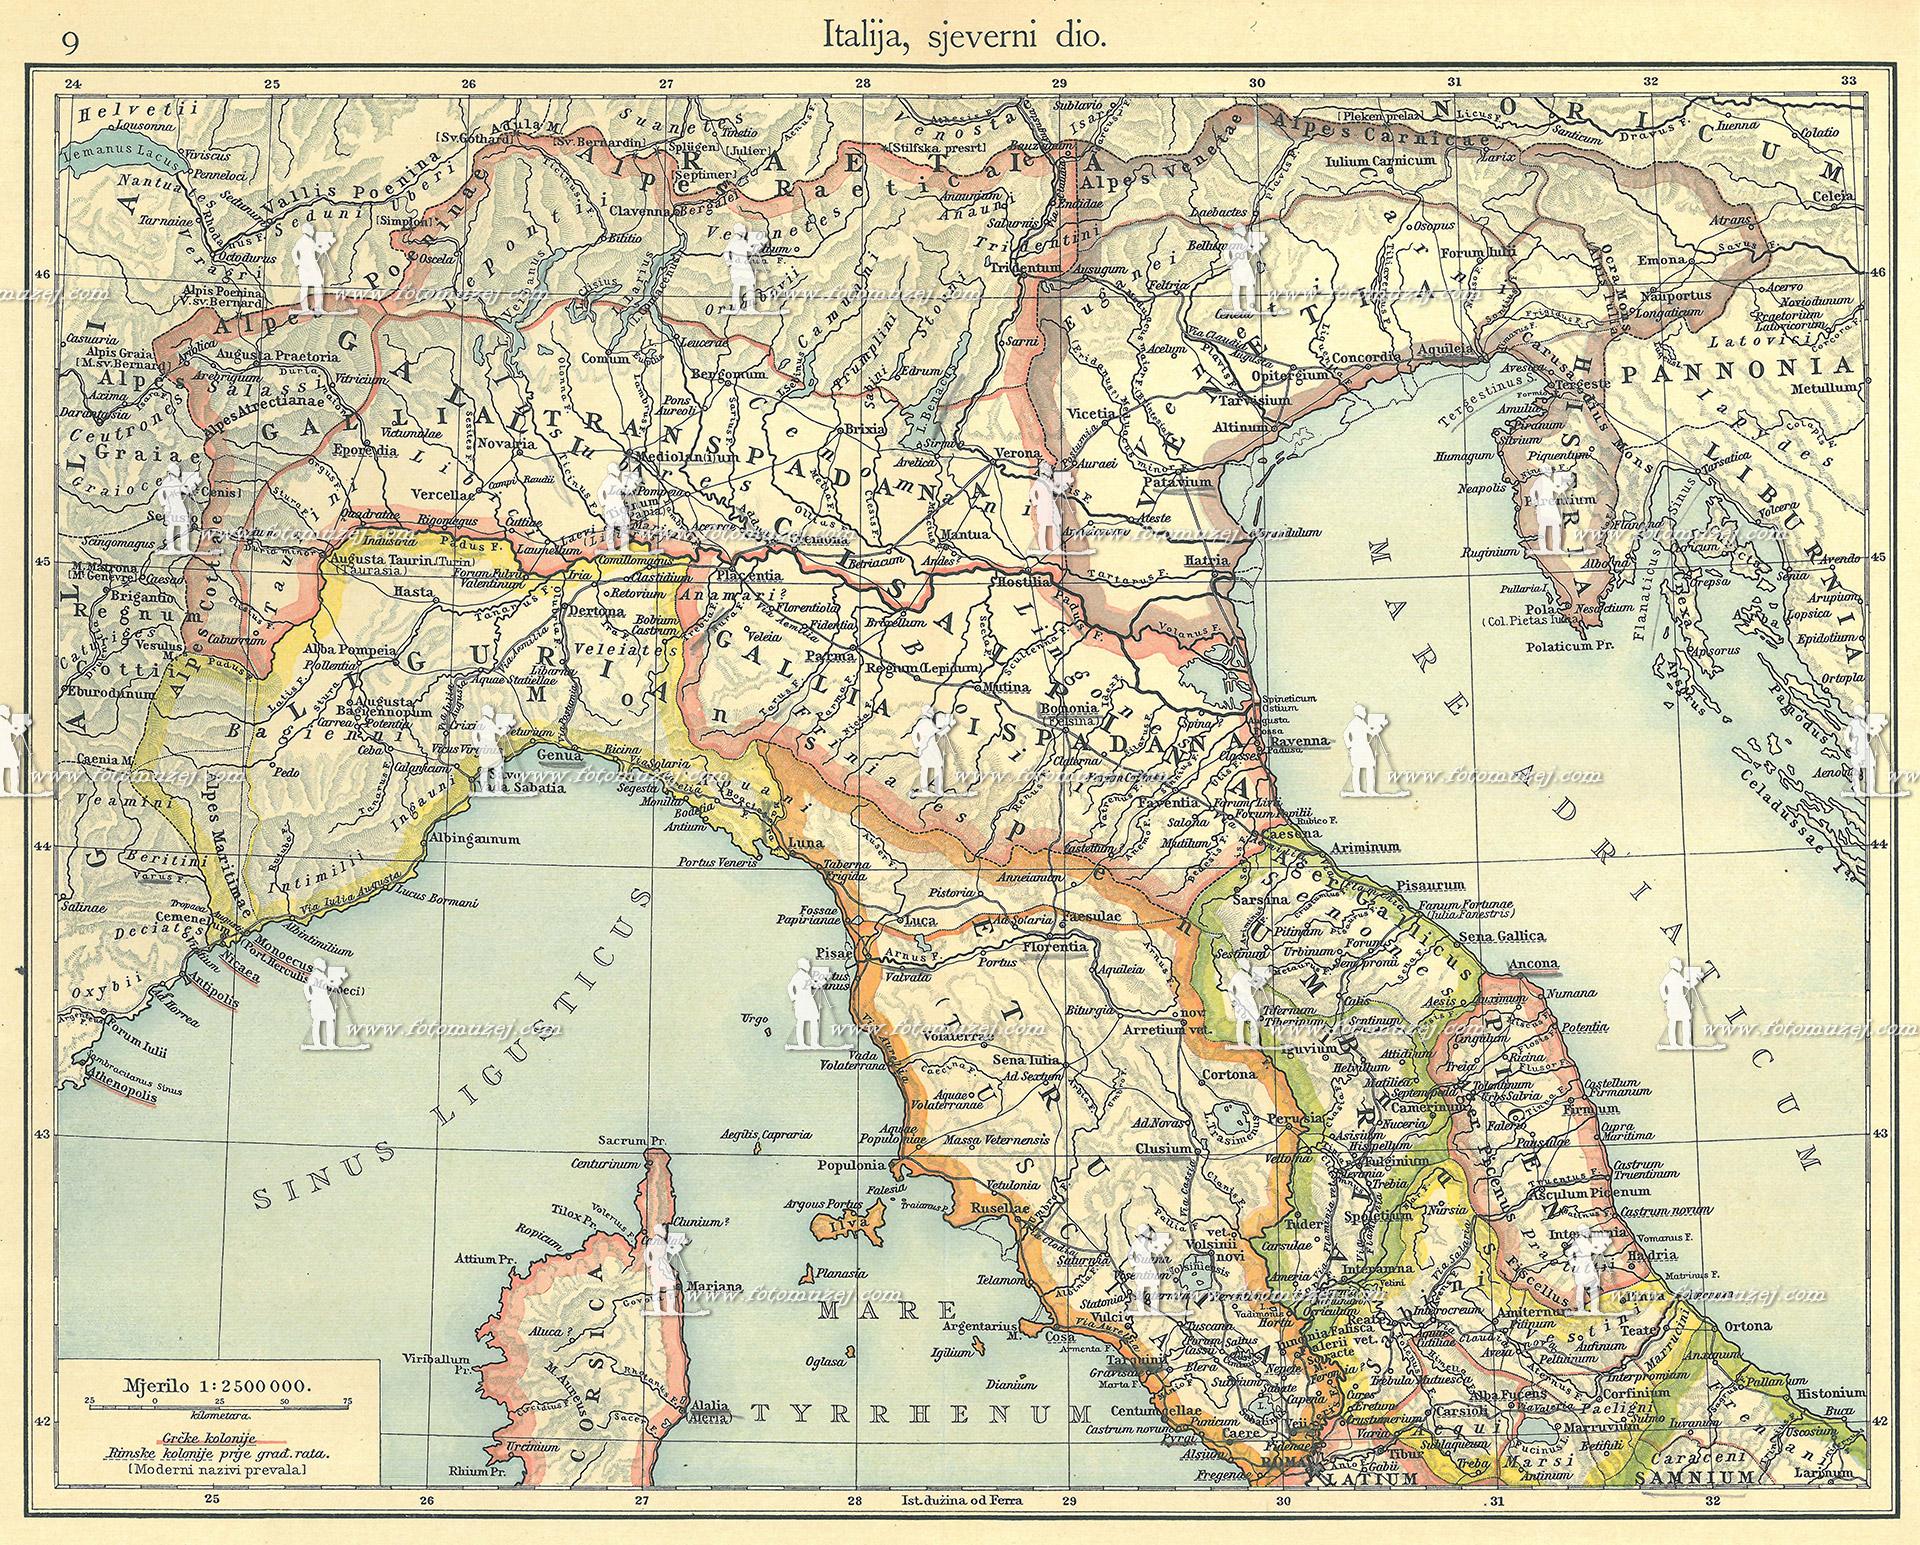 mapa severna italija Istorijska fotografija Italija, severni deo :: FotoMuzej  mapa severna italija